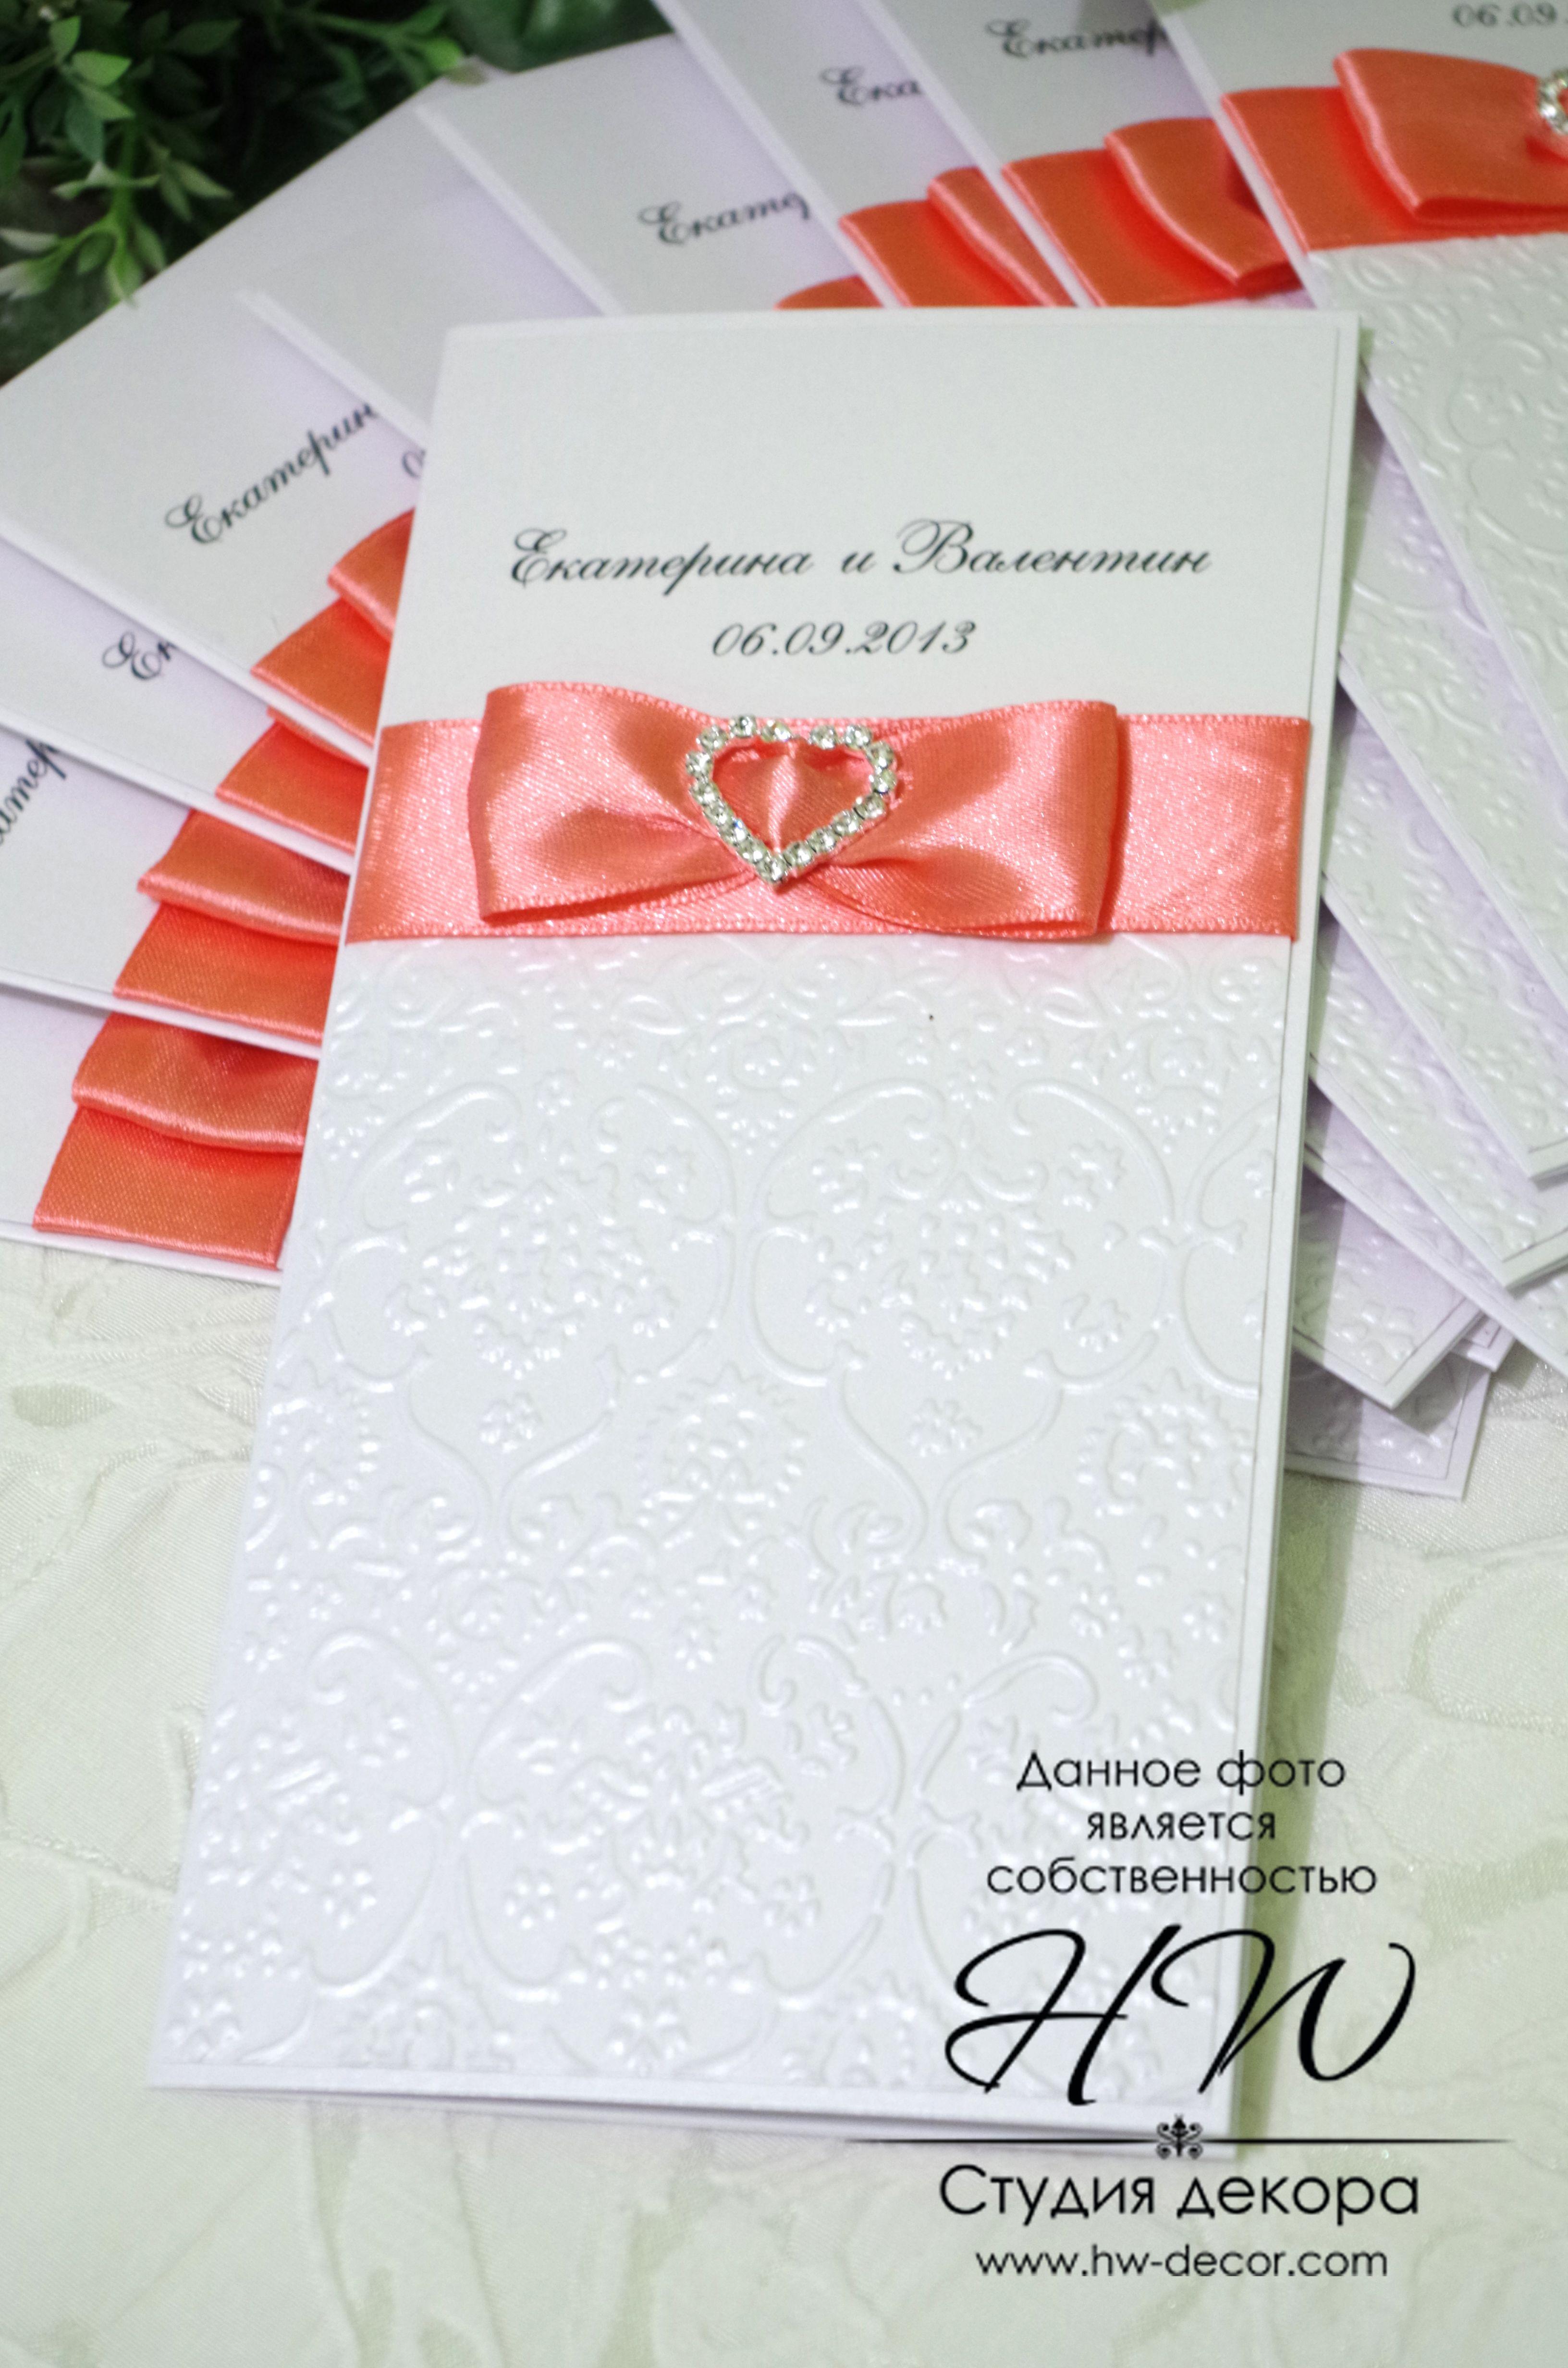 hand made wedding invitation with a rhinestones brooch | Hand made ...